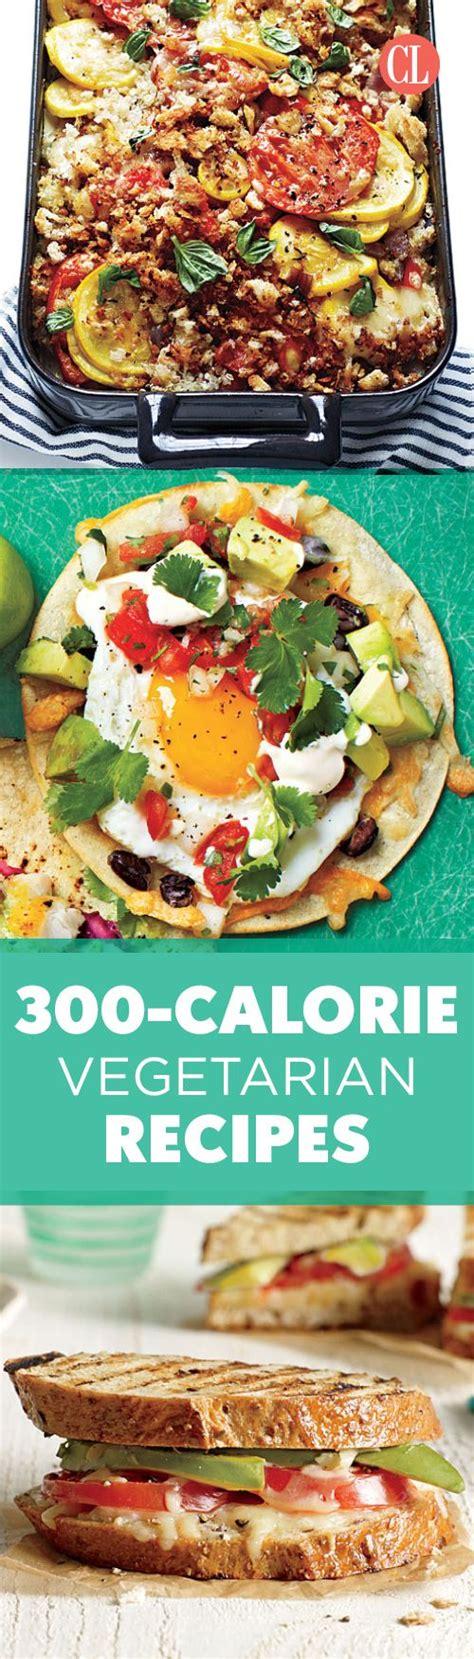 vegetarian diet weight loss recipes best 25 vegetarian diets ideas on vegetarian